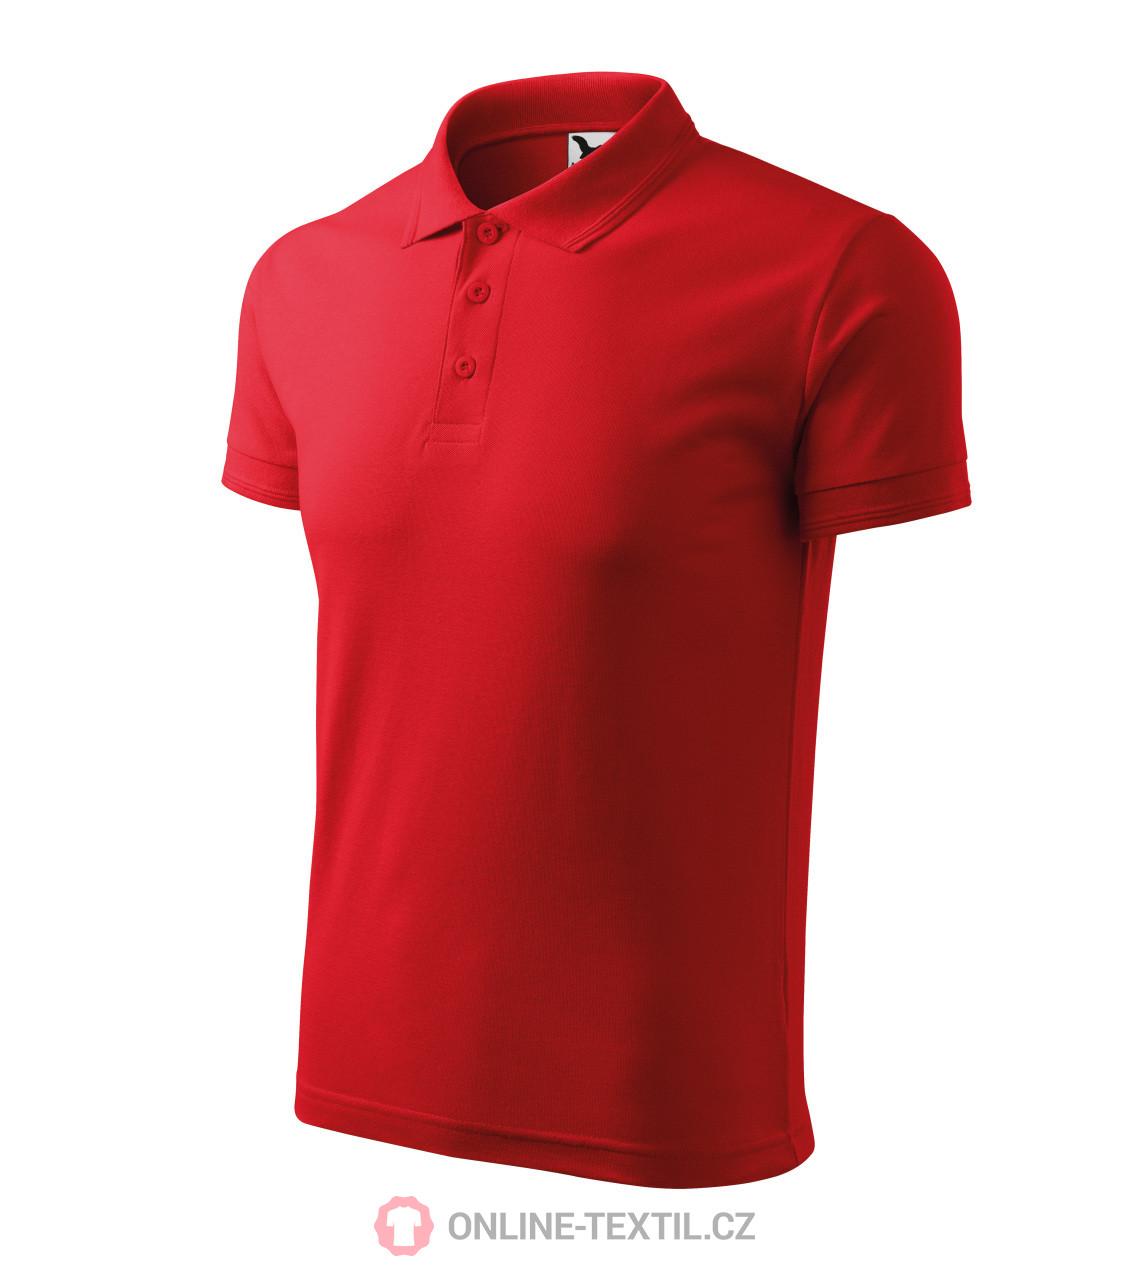 ADLER CZECH Polokošile pánská Pique Polo vyšší gramáže 203 - červená ... 7076c1e20c